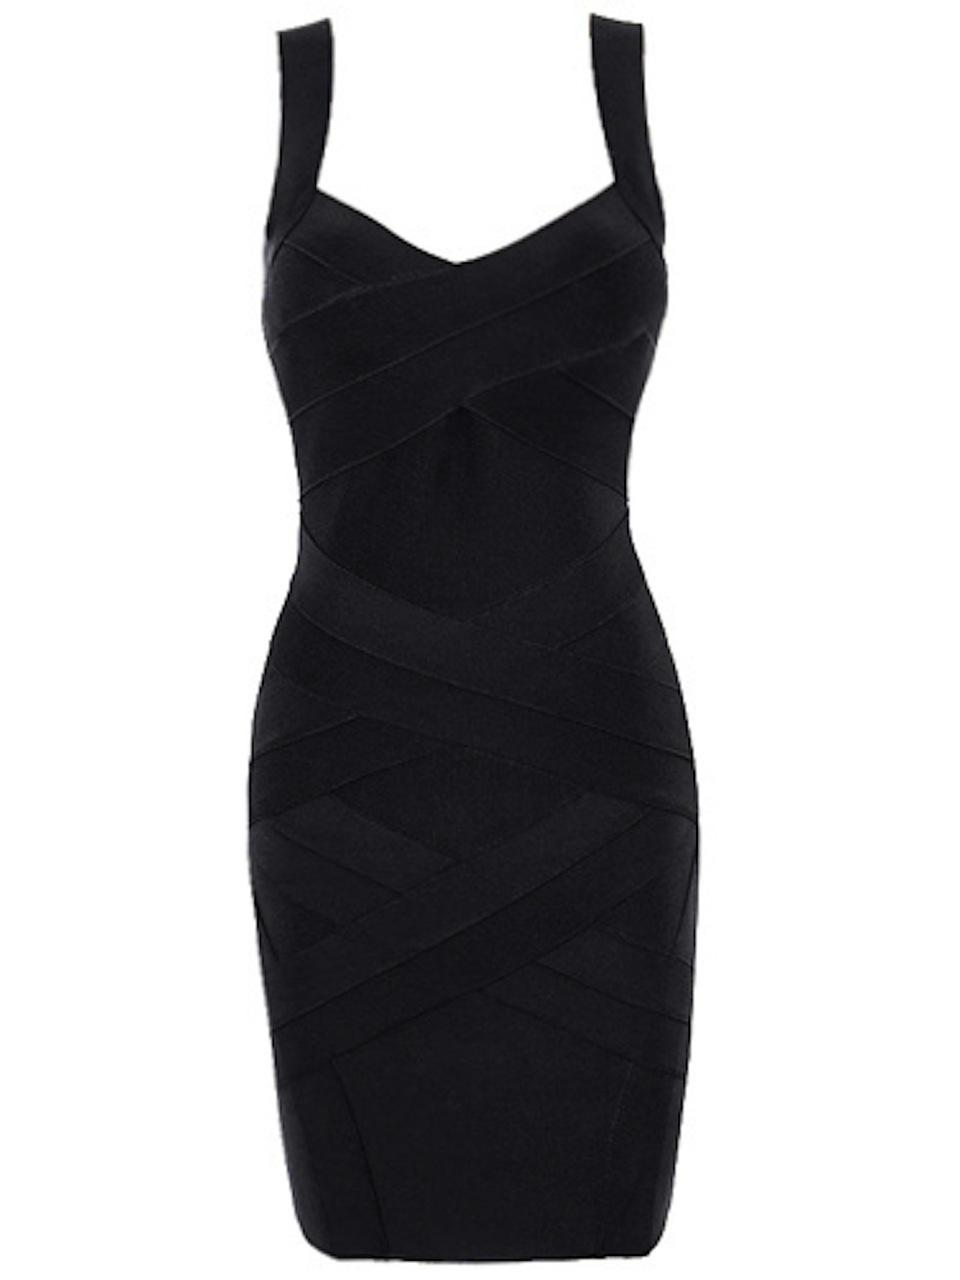 SMALL - Black Little Classic Cross Back Celeb Bandage Mini Dress -LAST ONE